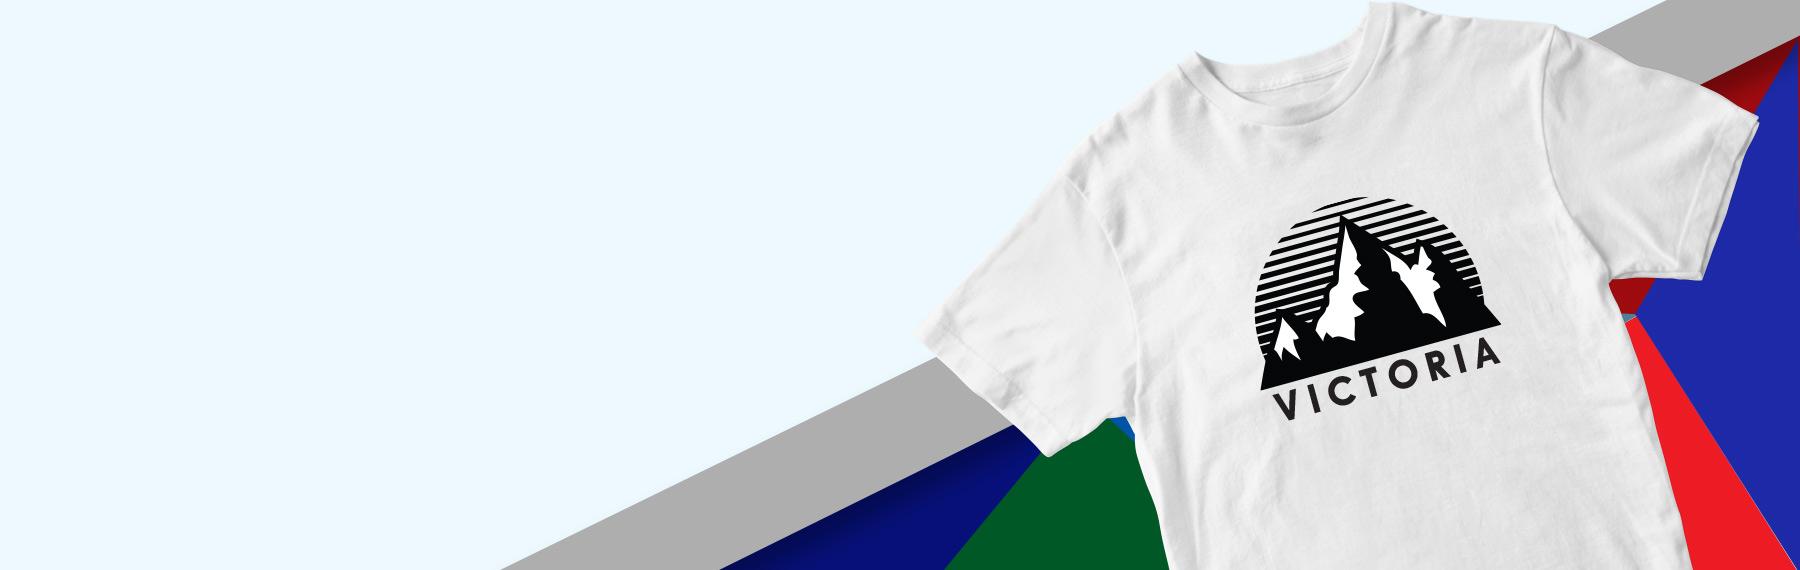 Order Custom T-Shirts in Victoria | T-Shirt Elephant